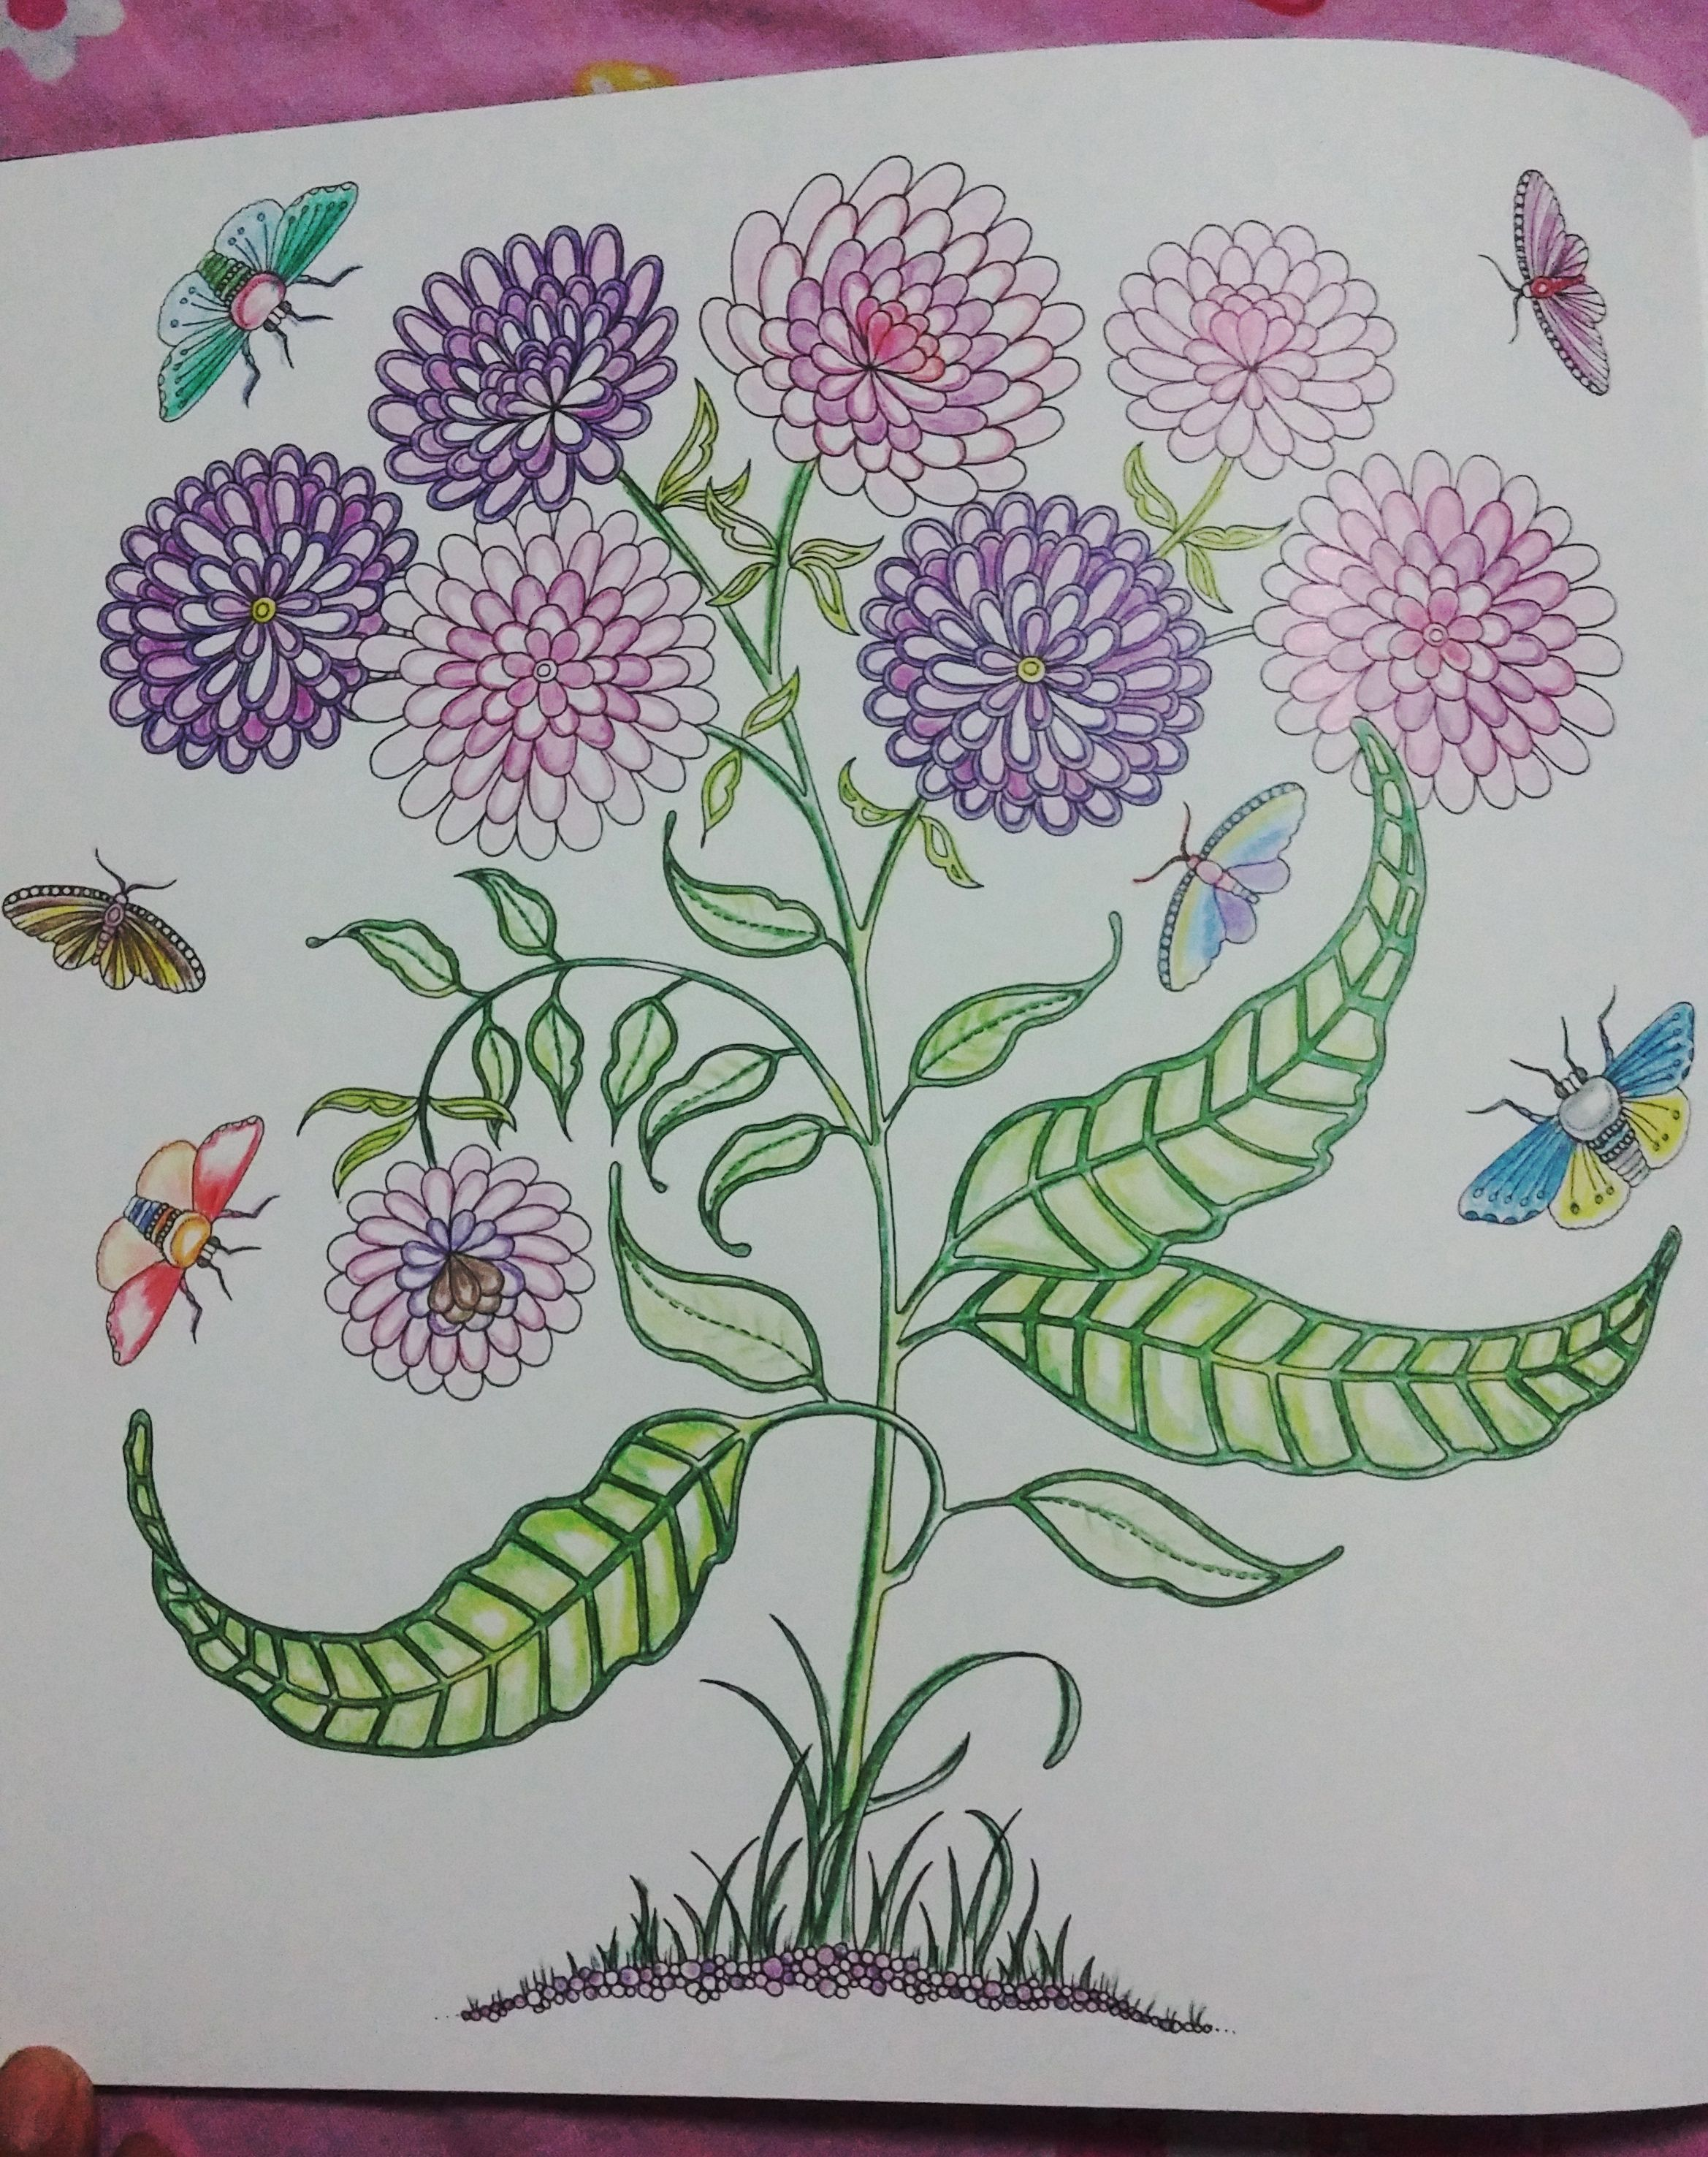 secret garden johanna basford flowers - Google Search   Coloring ...